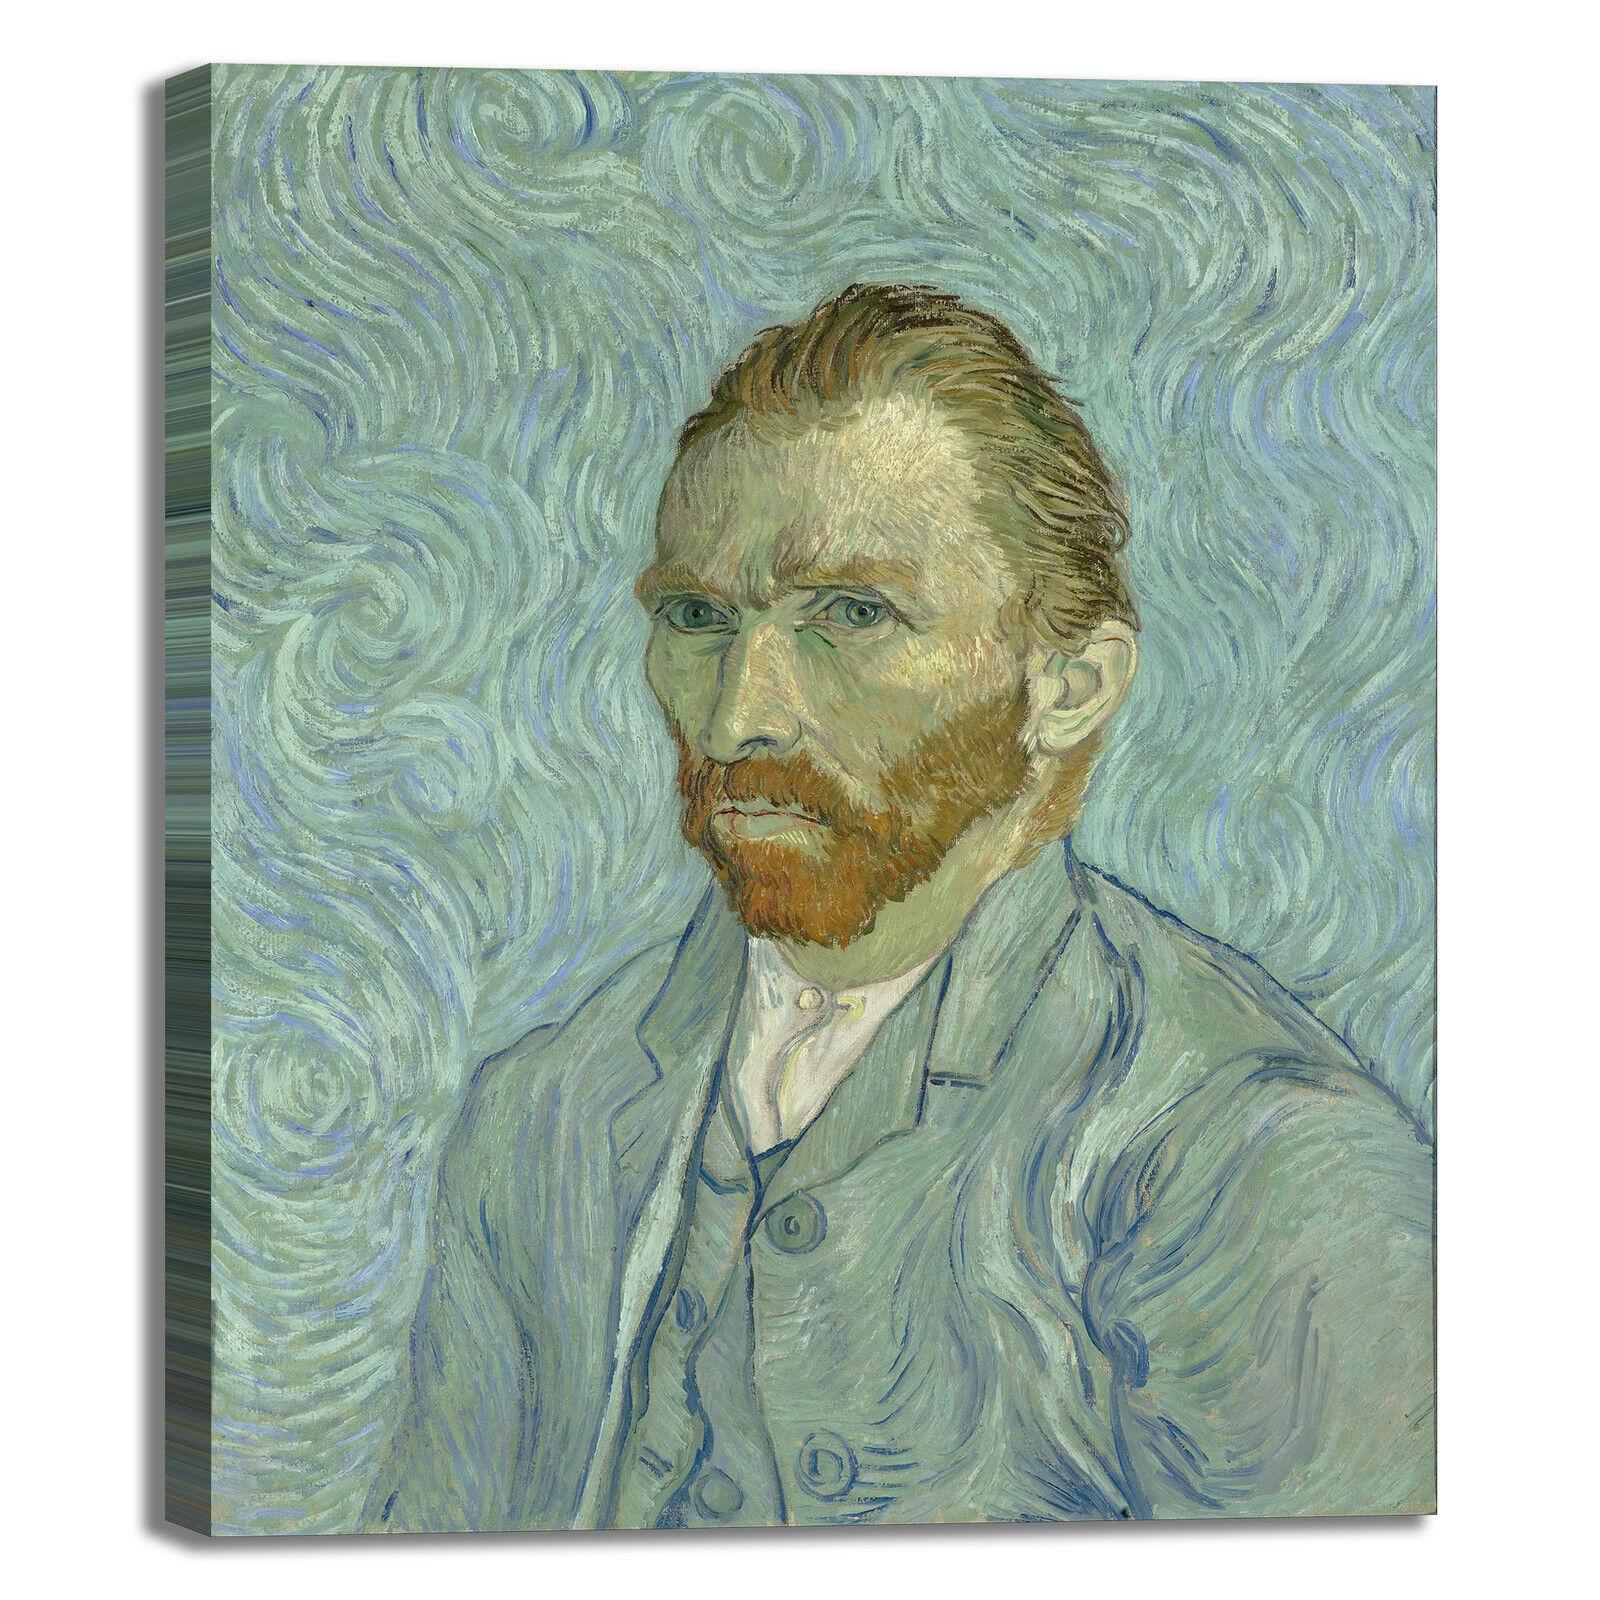 Van Gogh autoritratto design quadro stampa tela dipinto telaio arroto casa